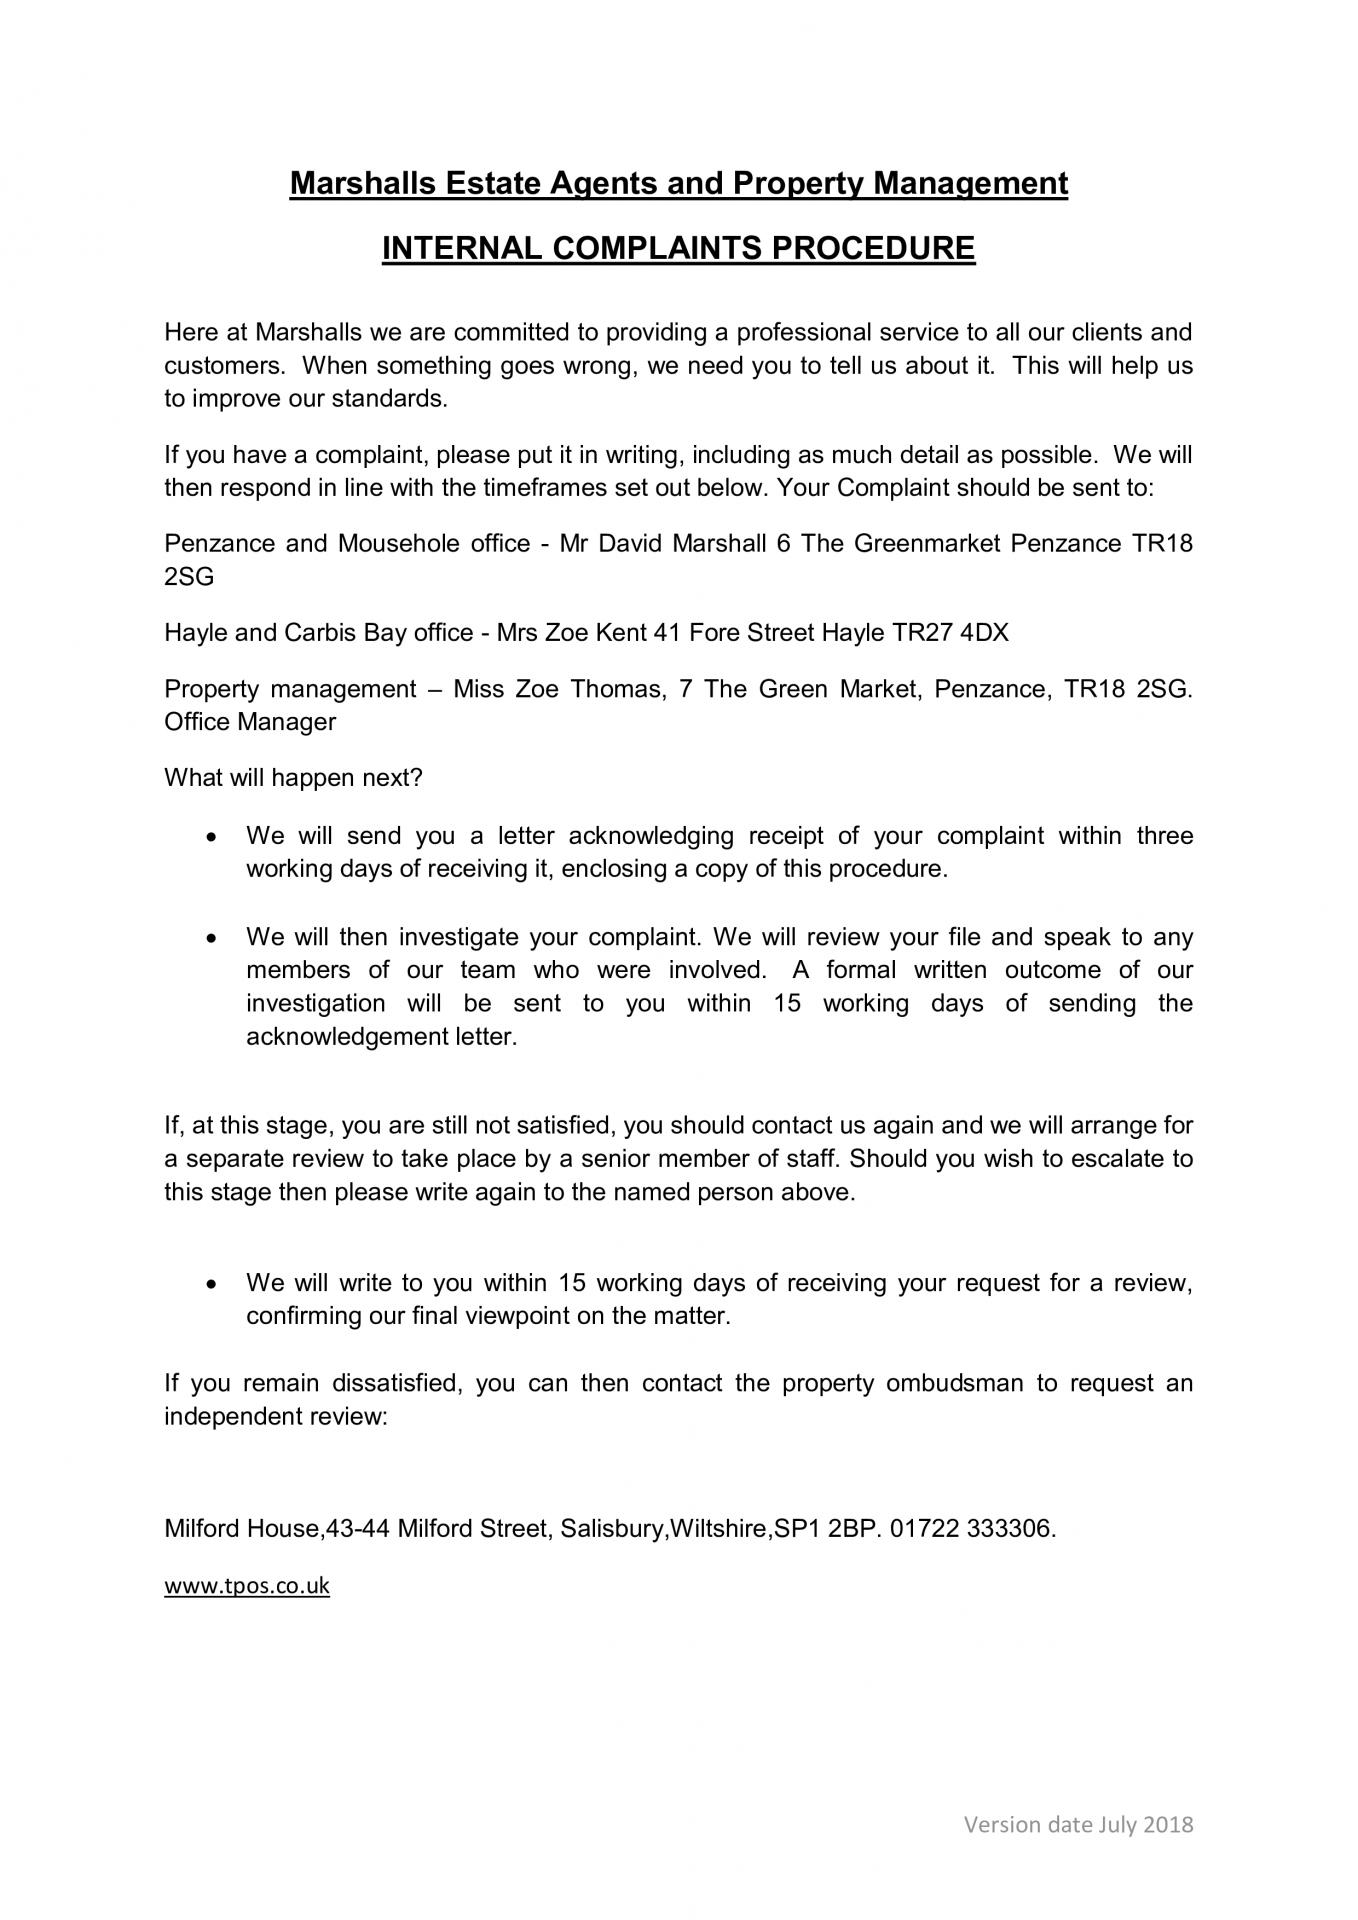 marshalls_property_management_complaints_procedure7259_hd